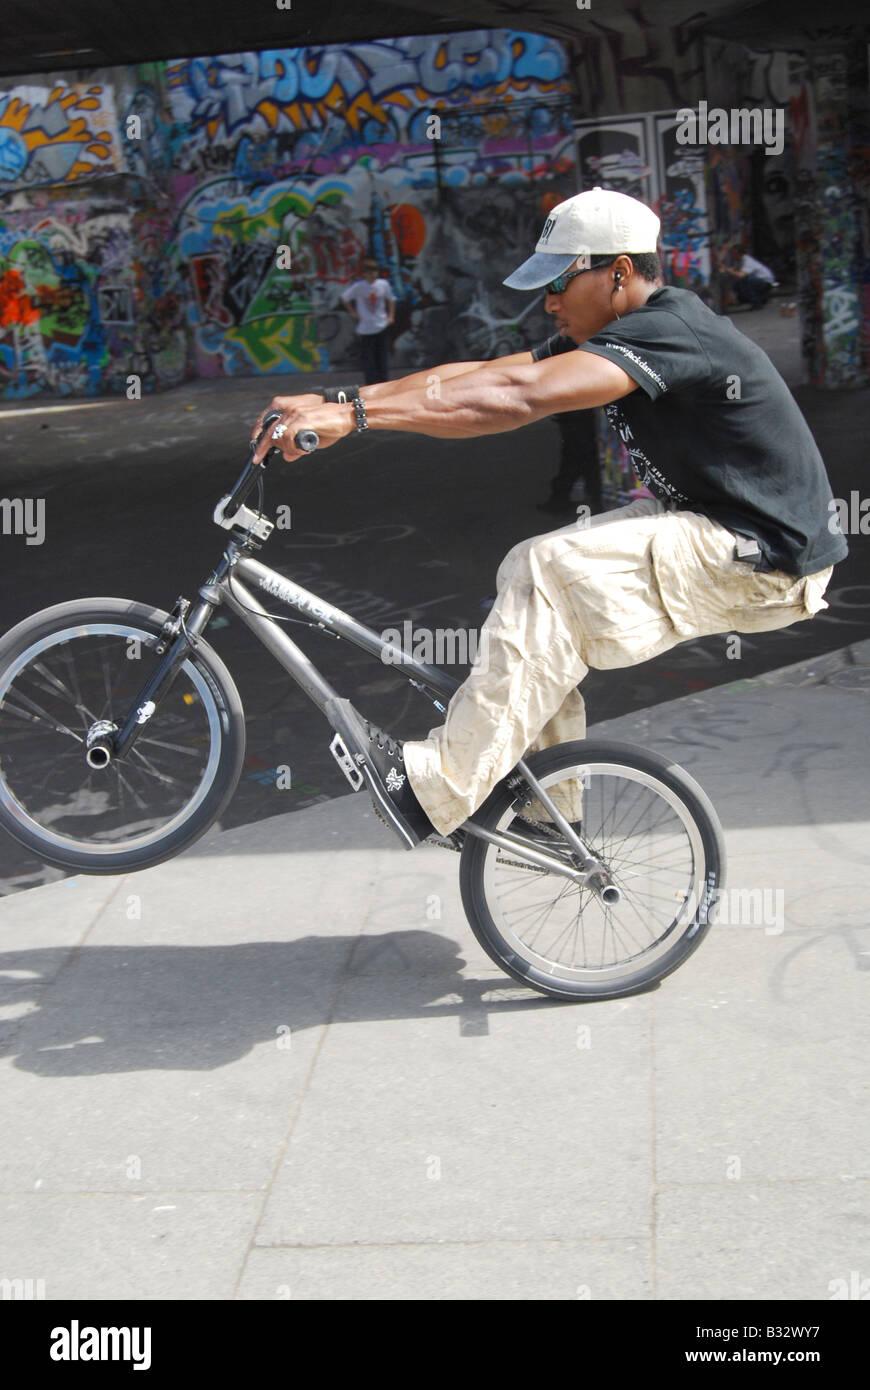 BMX wheelie urban sport London grime graffiti city concrete slacker - Stock Image